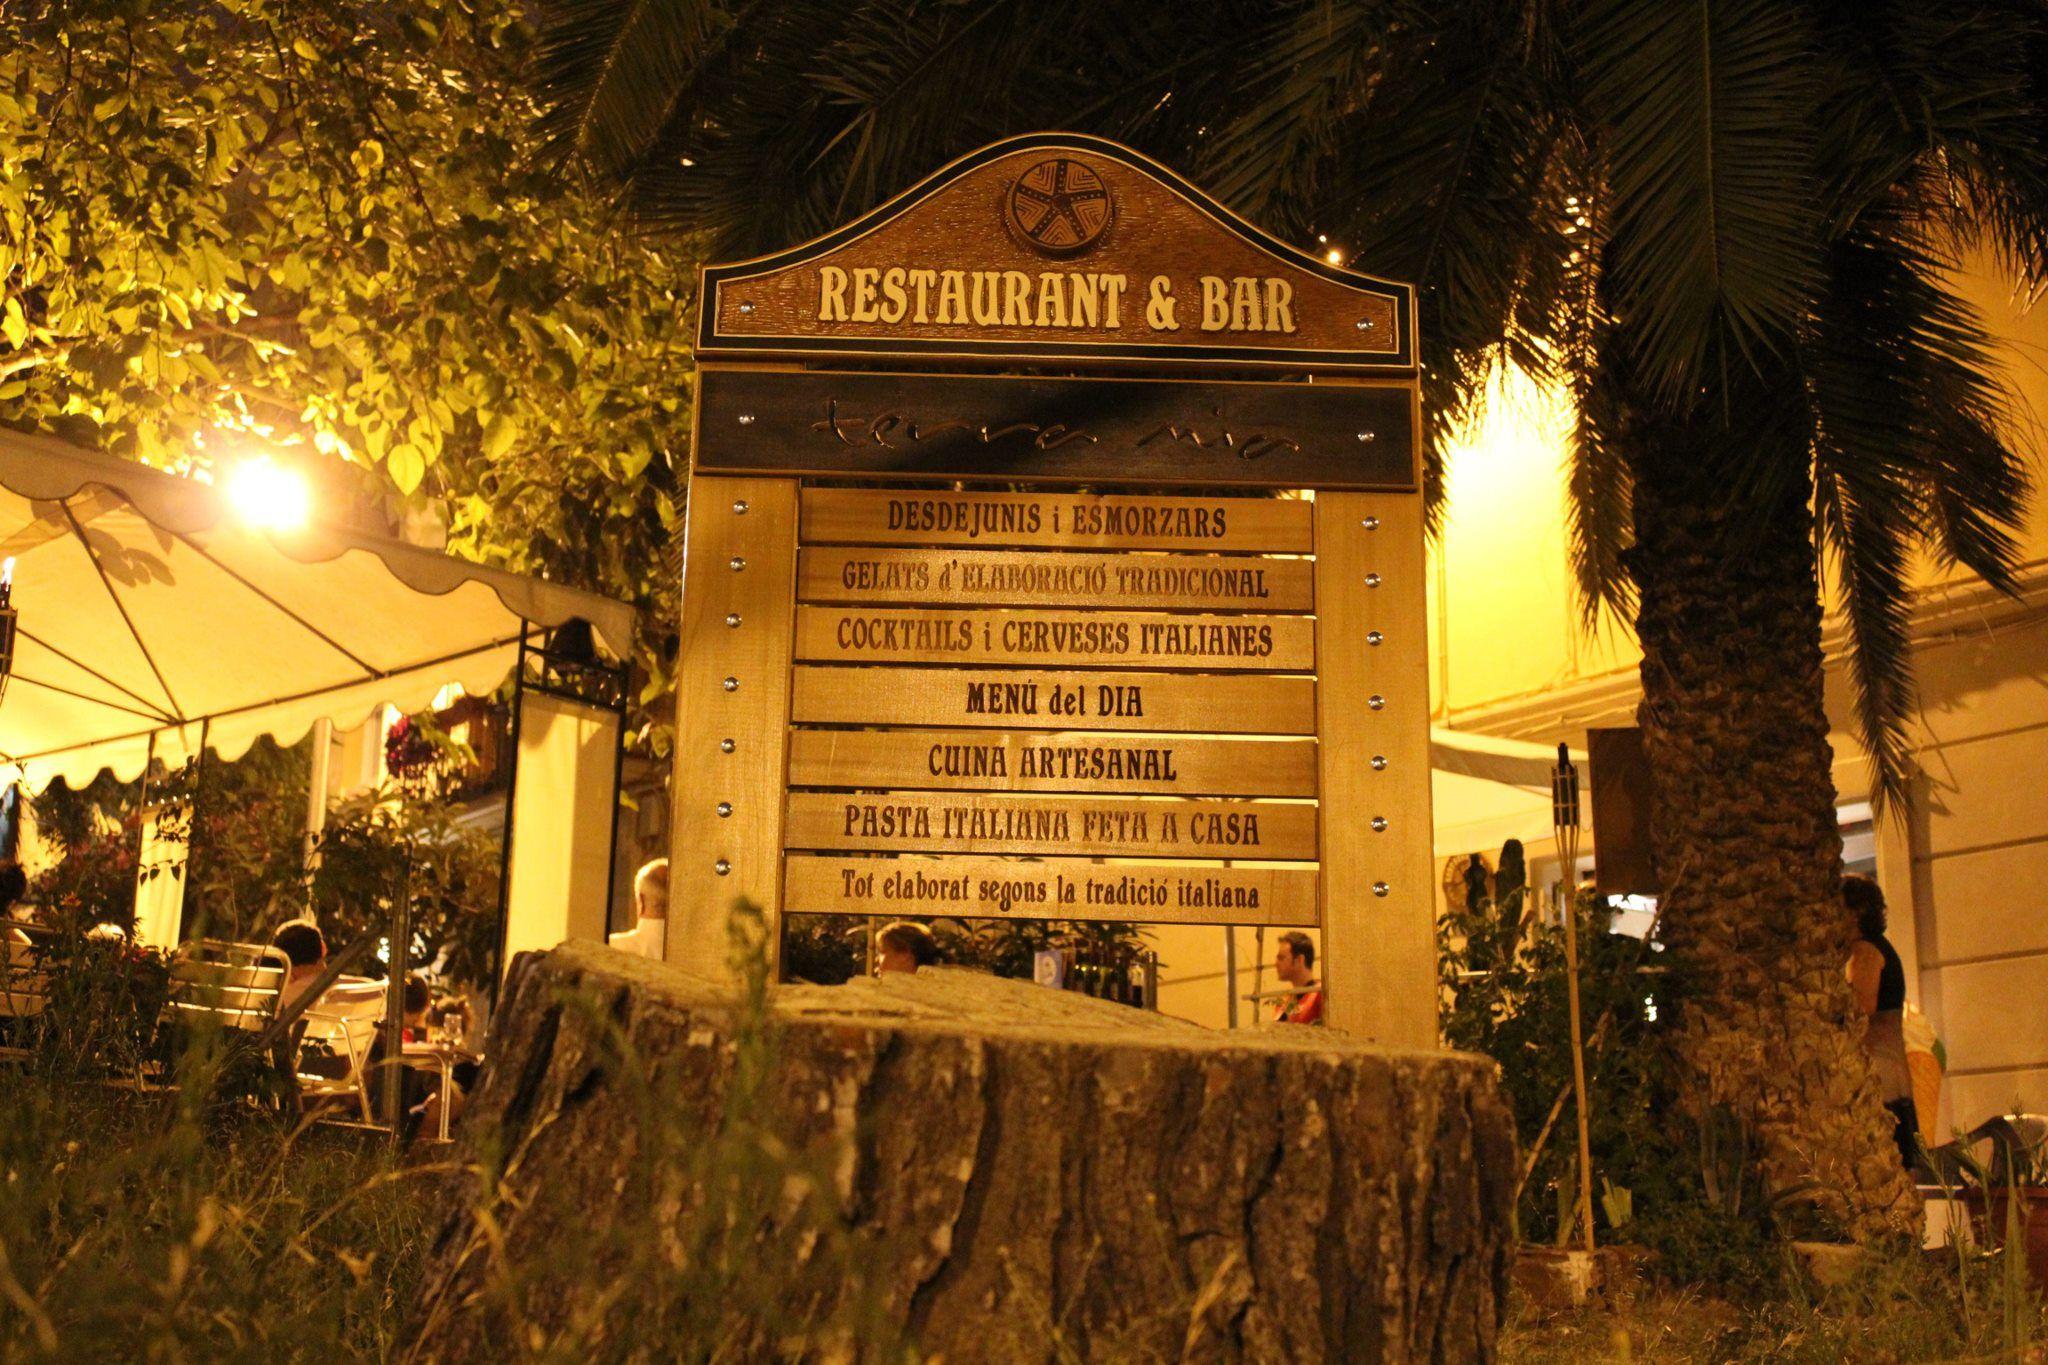 Gastronomía mediterránea en Barcelona